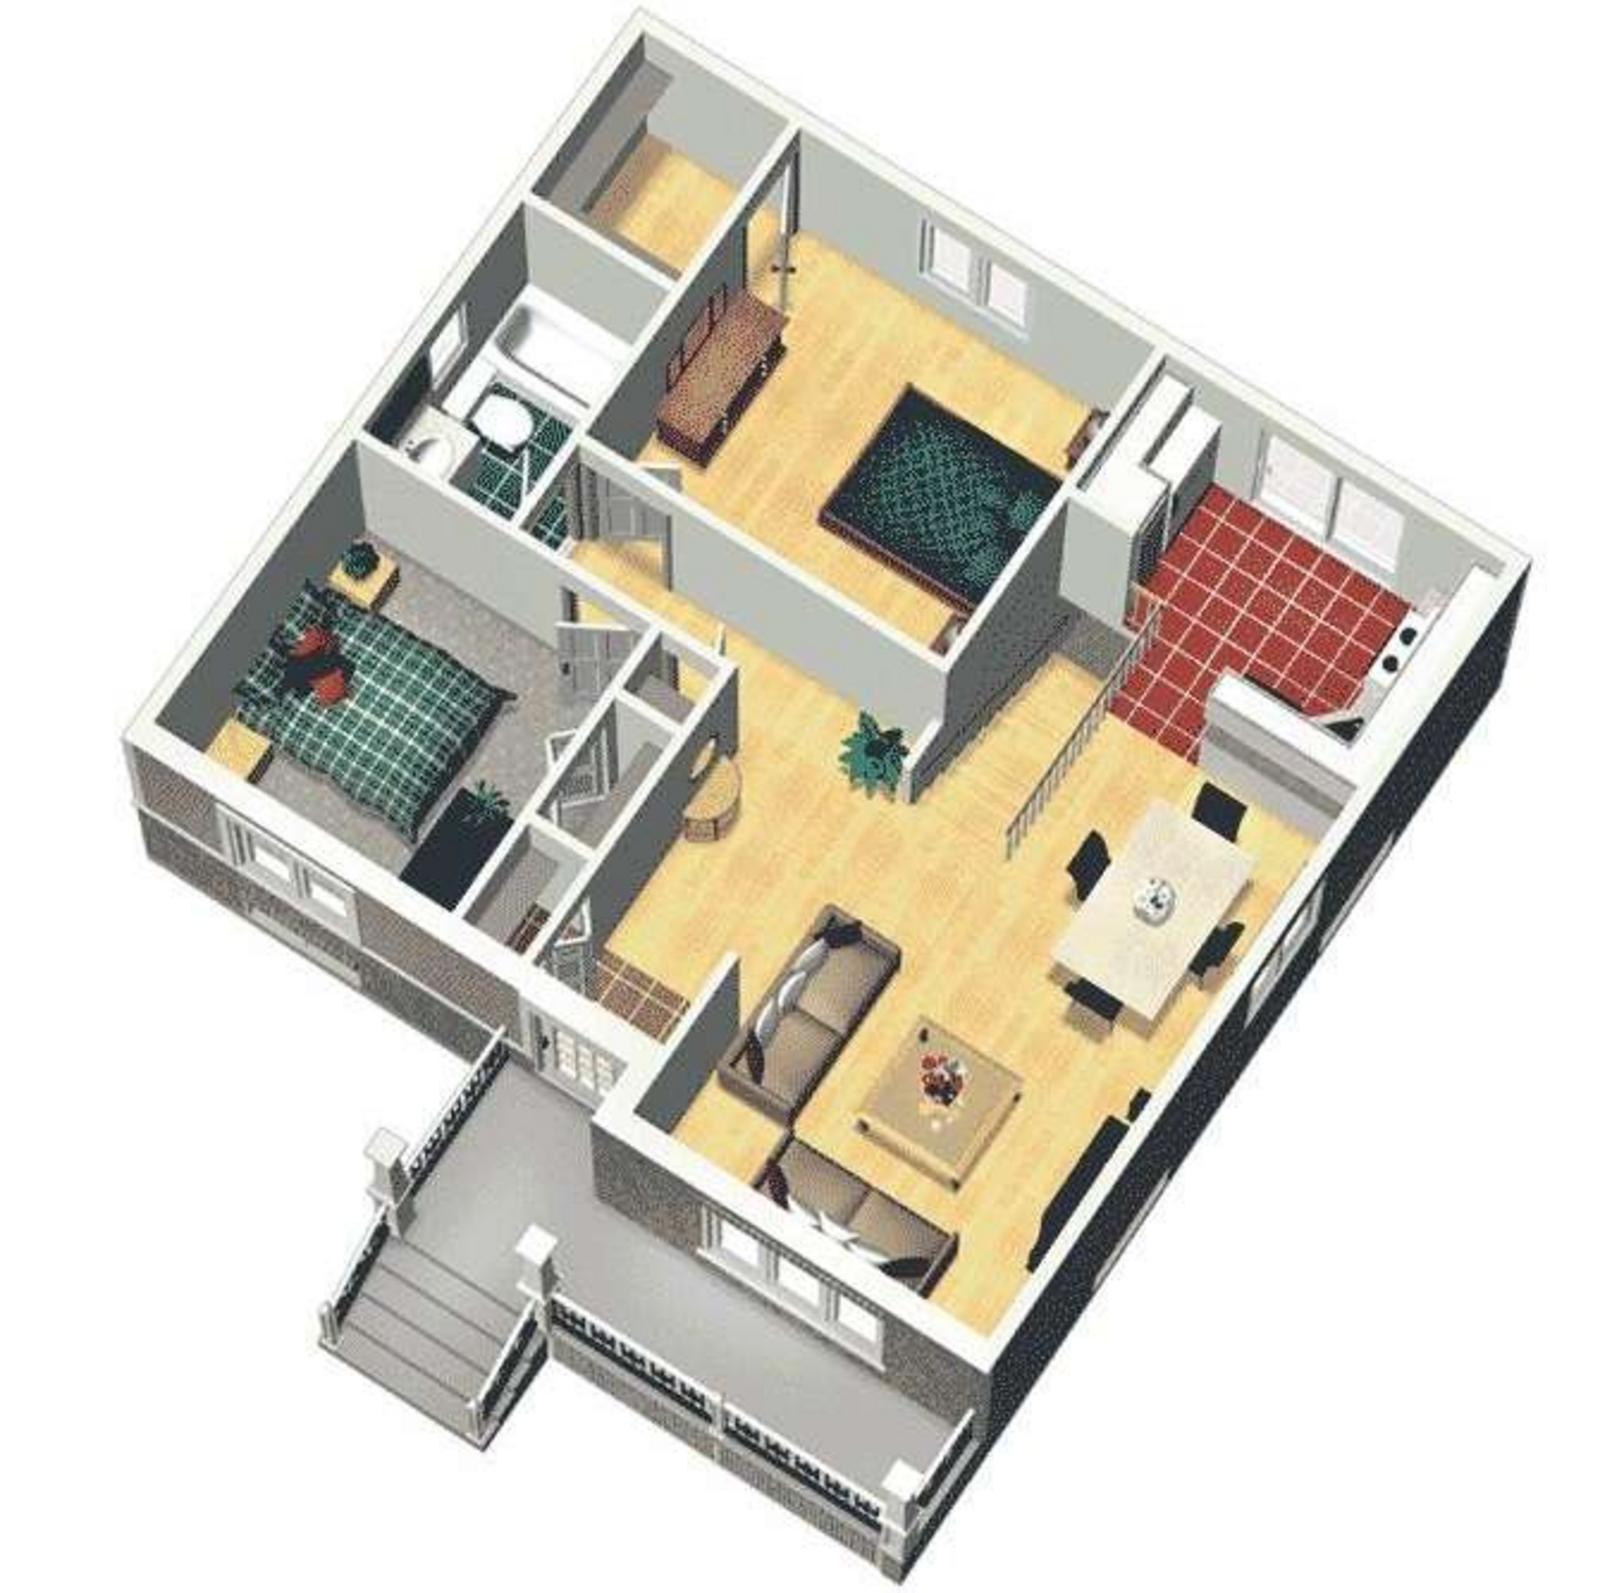 floor-plan7.jpg